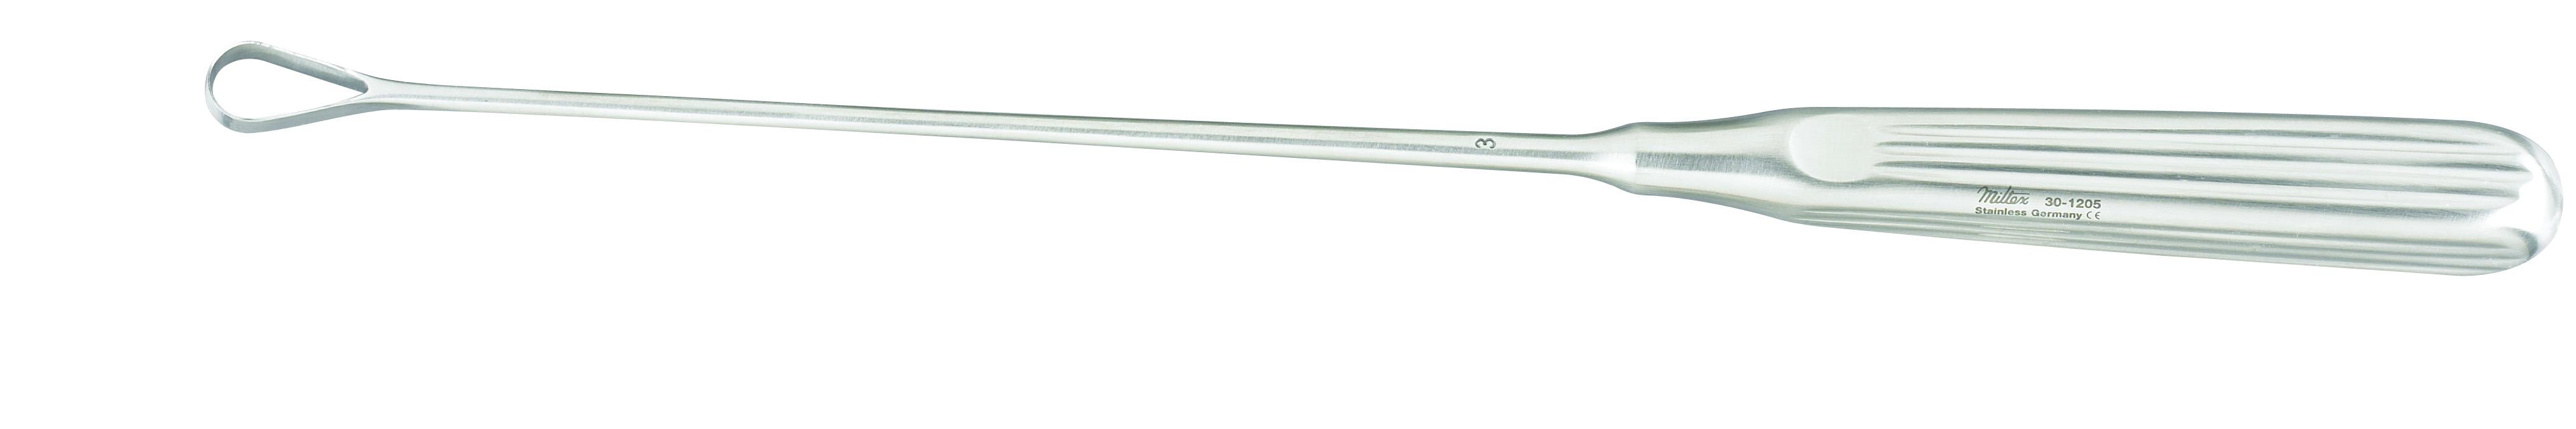 sims-uterine-curette-11-279-cm-sharp-blades-on-malleable-hank-size-3-30-1205-3-miltex.jpg